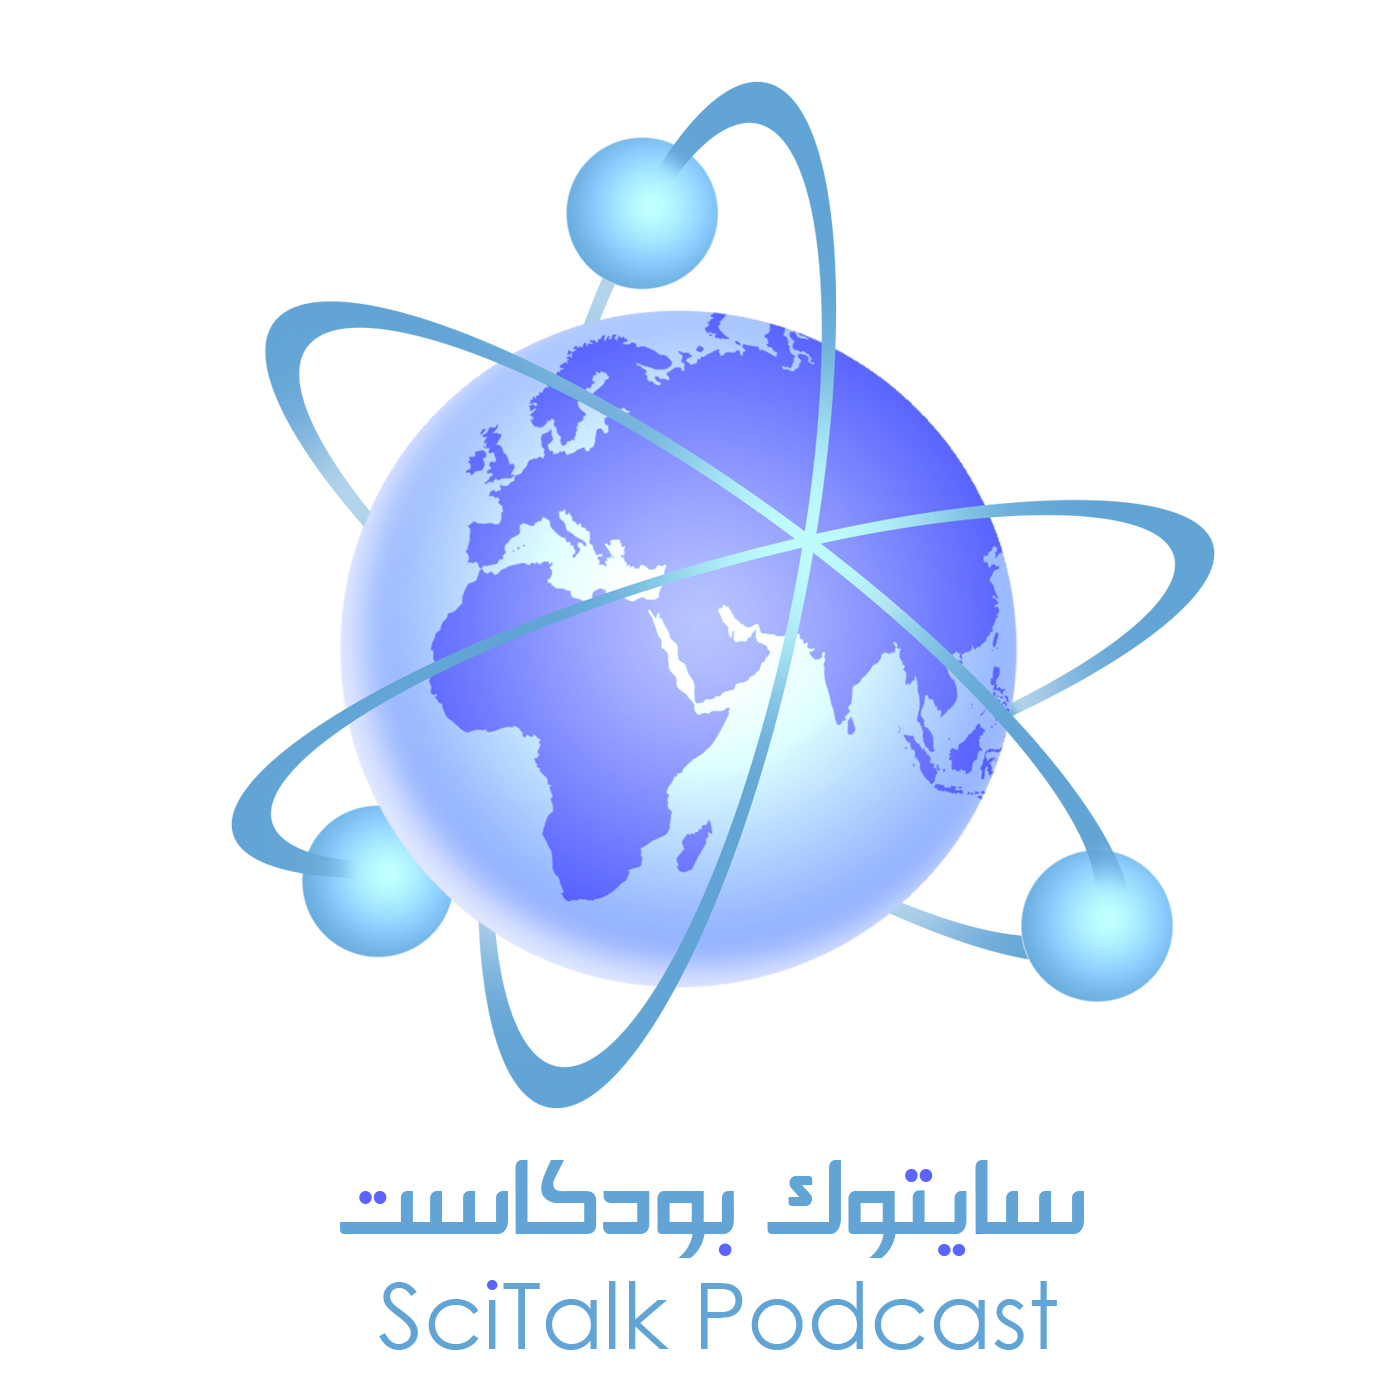 SciTalk Podcast